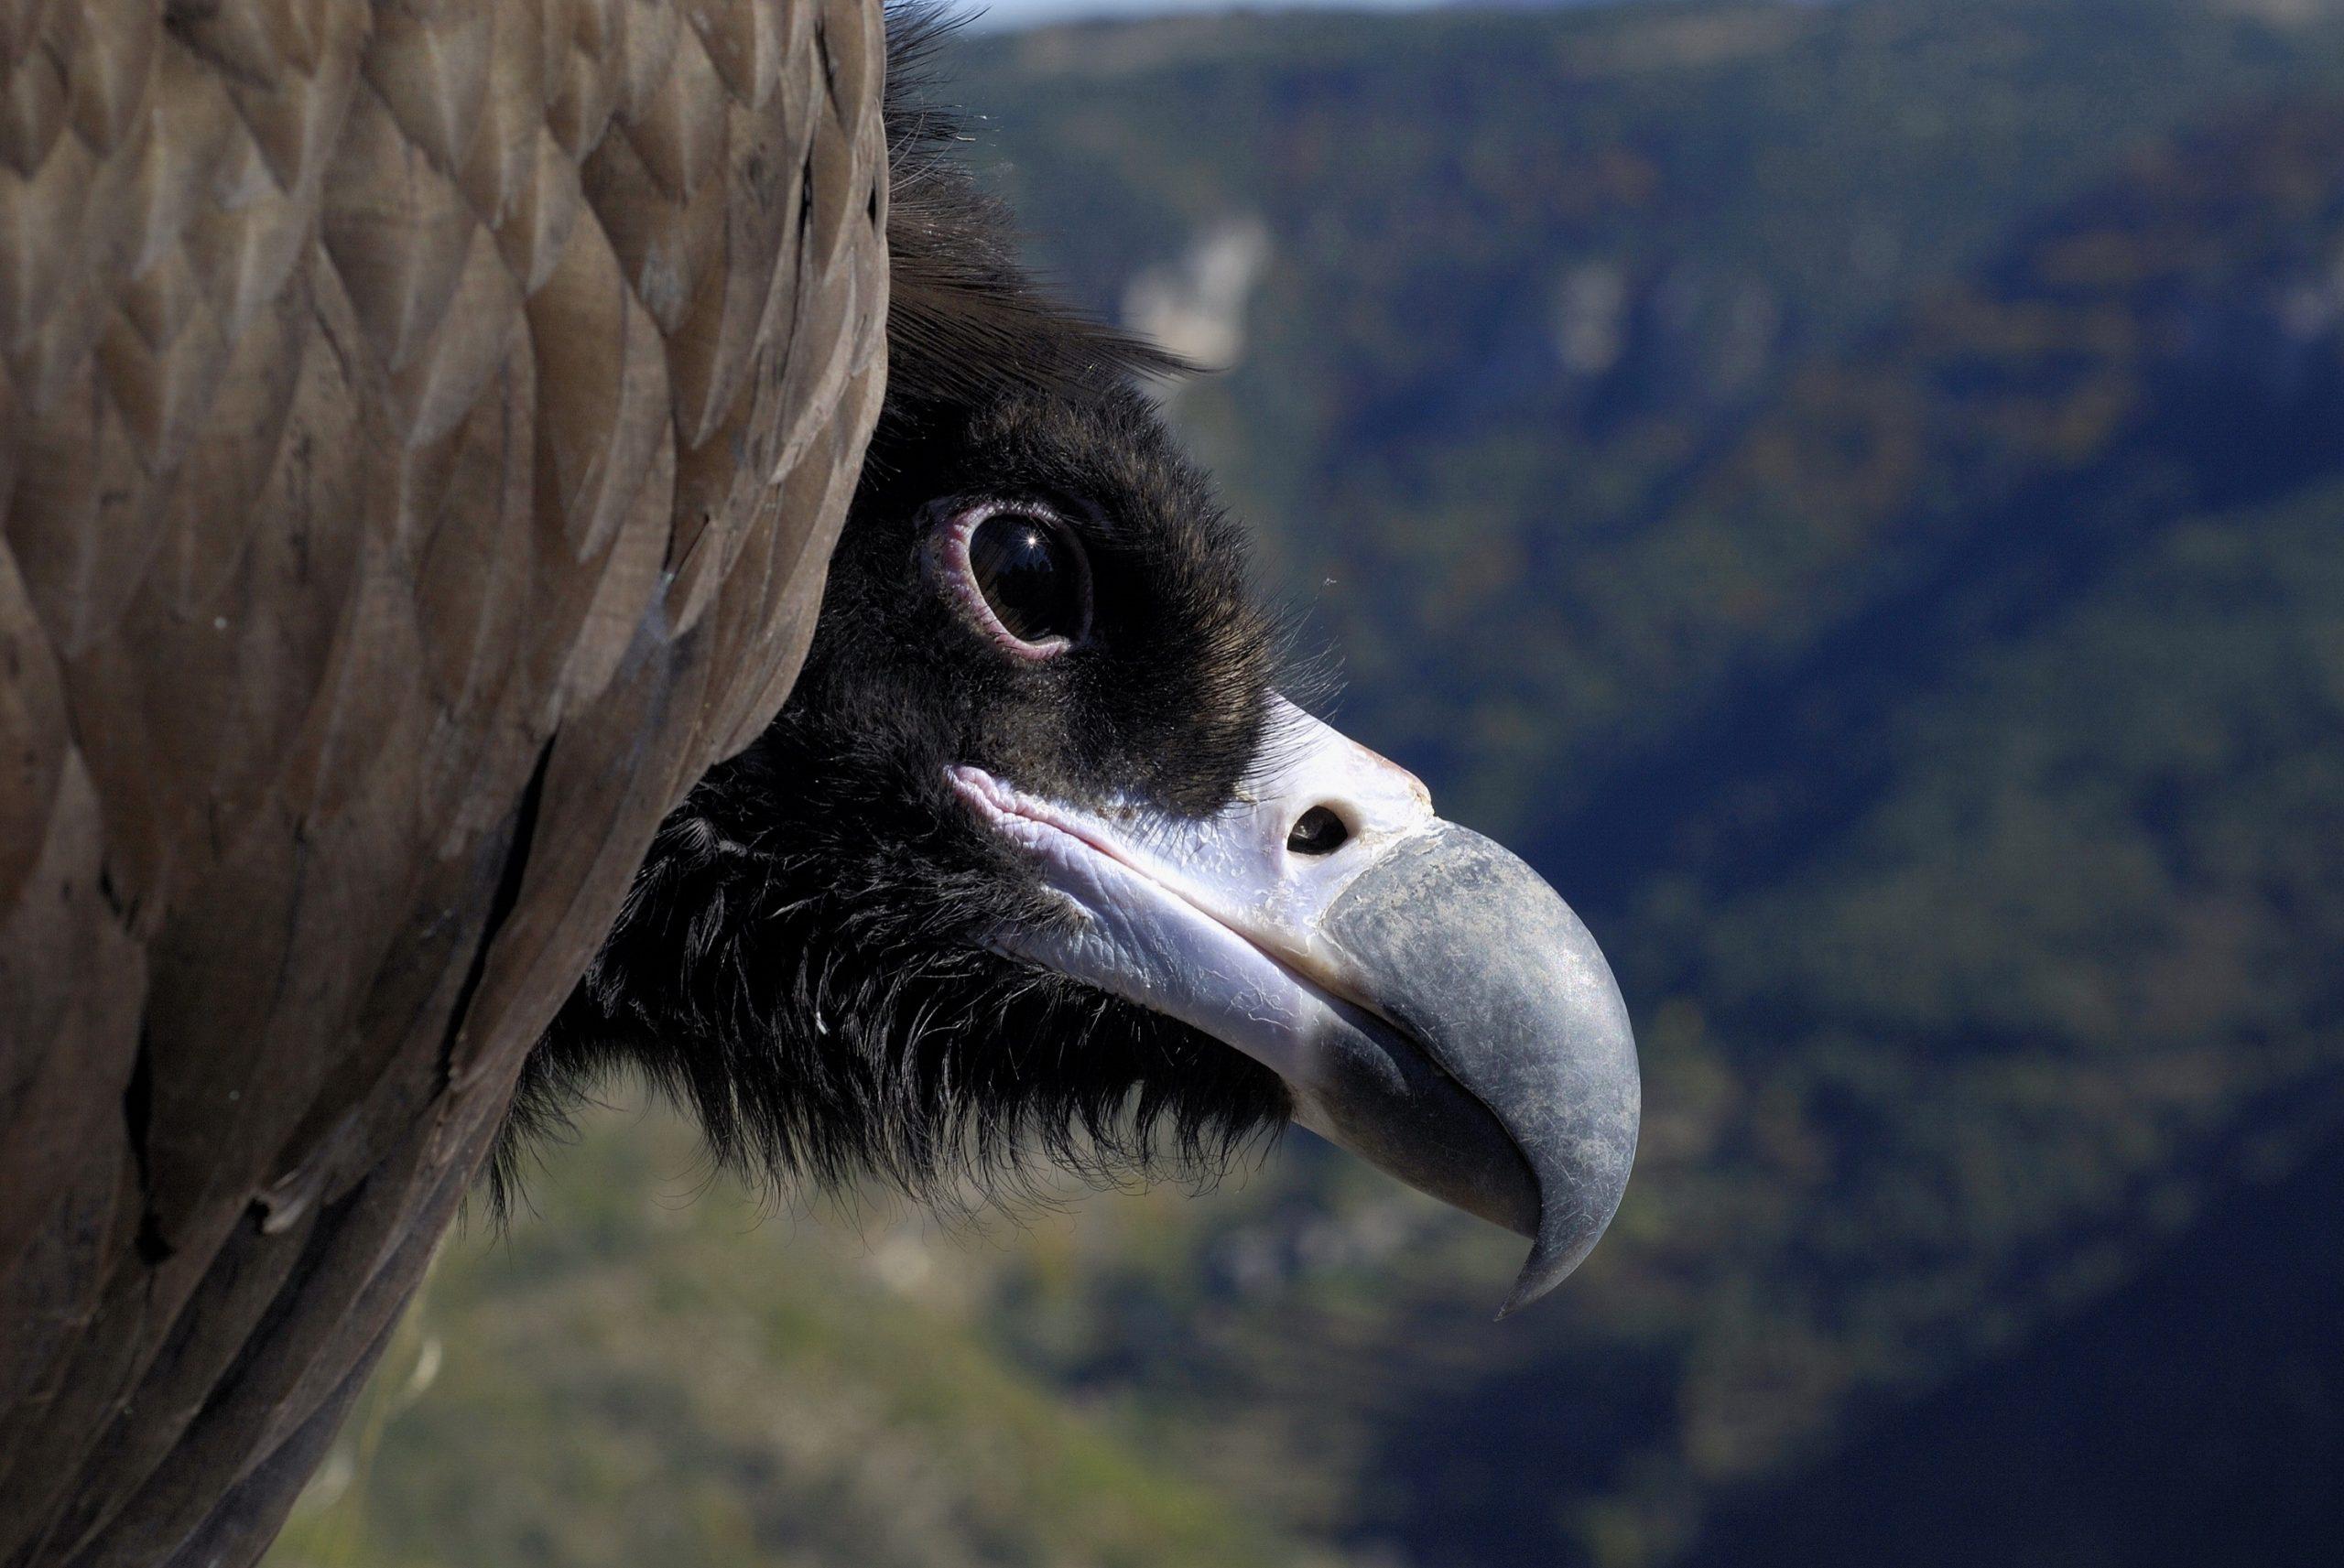 Cinereous vulture closeup